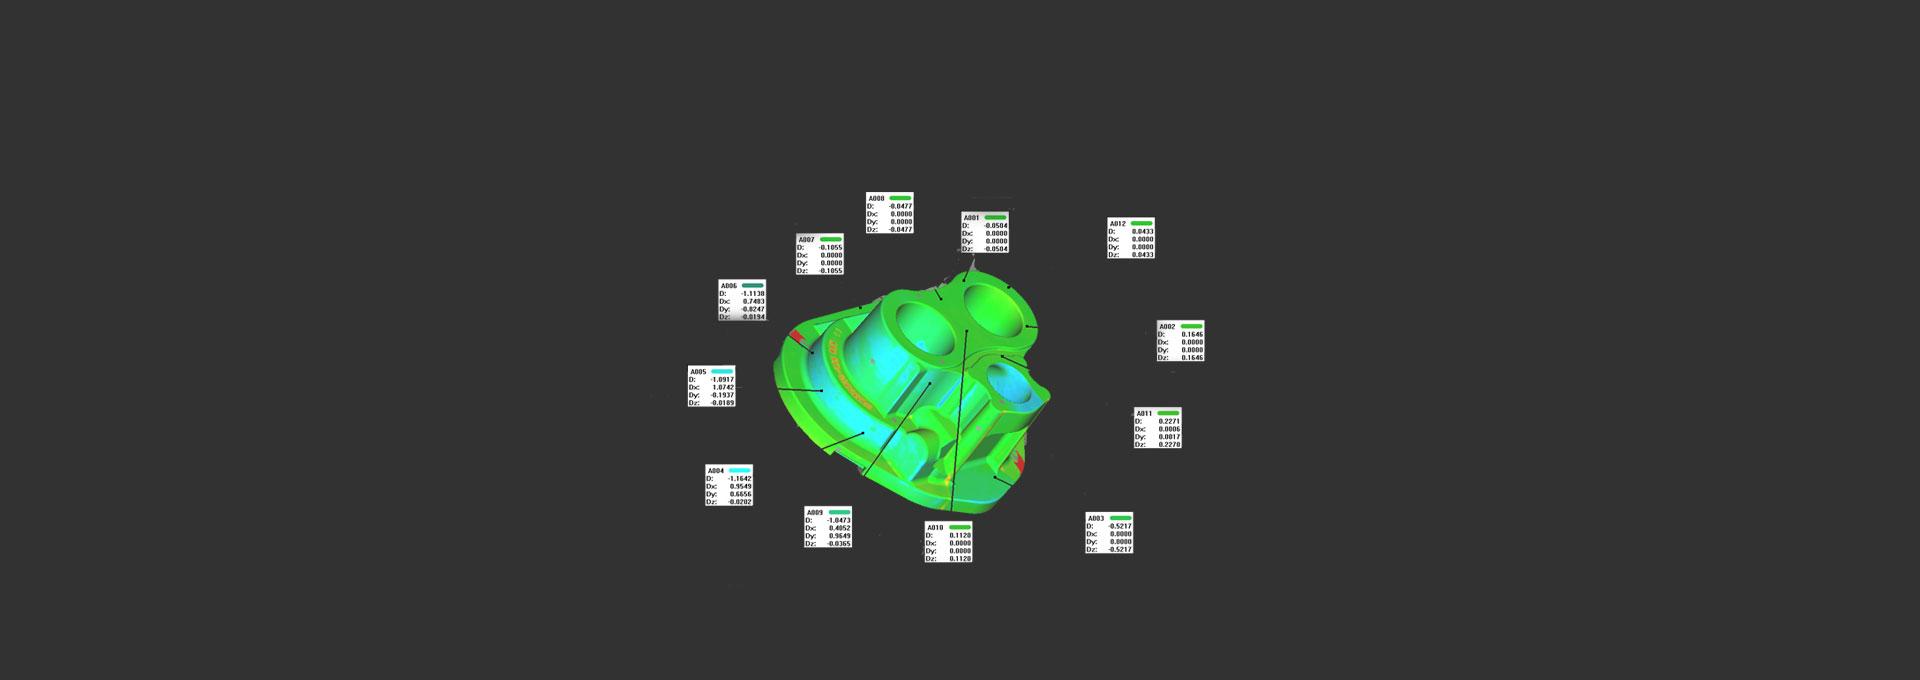 PRINCE335 Handheld 3D Scanner 2